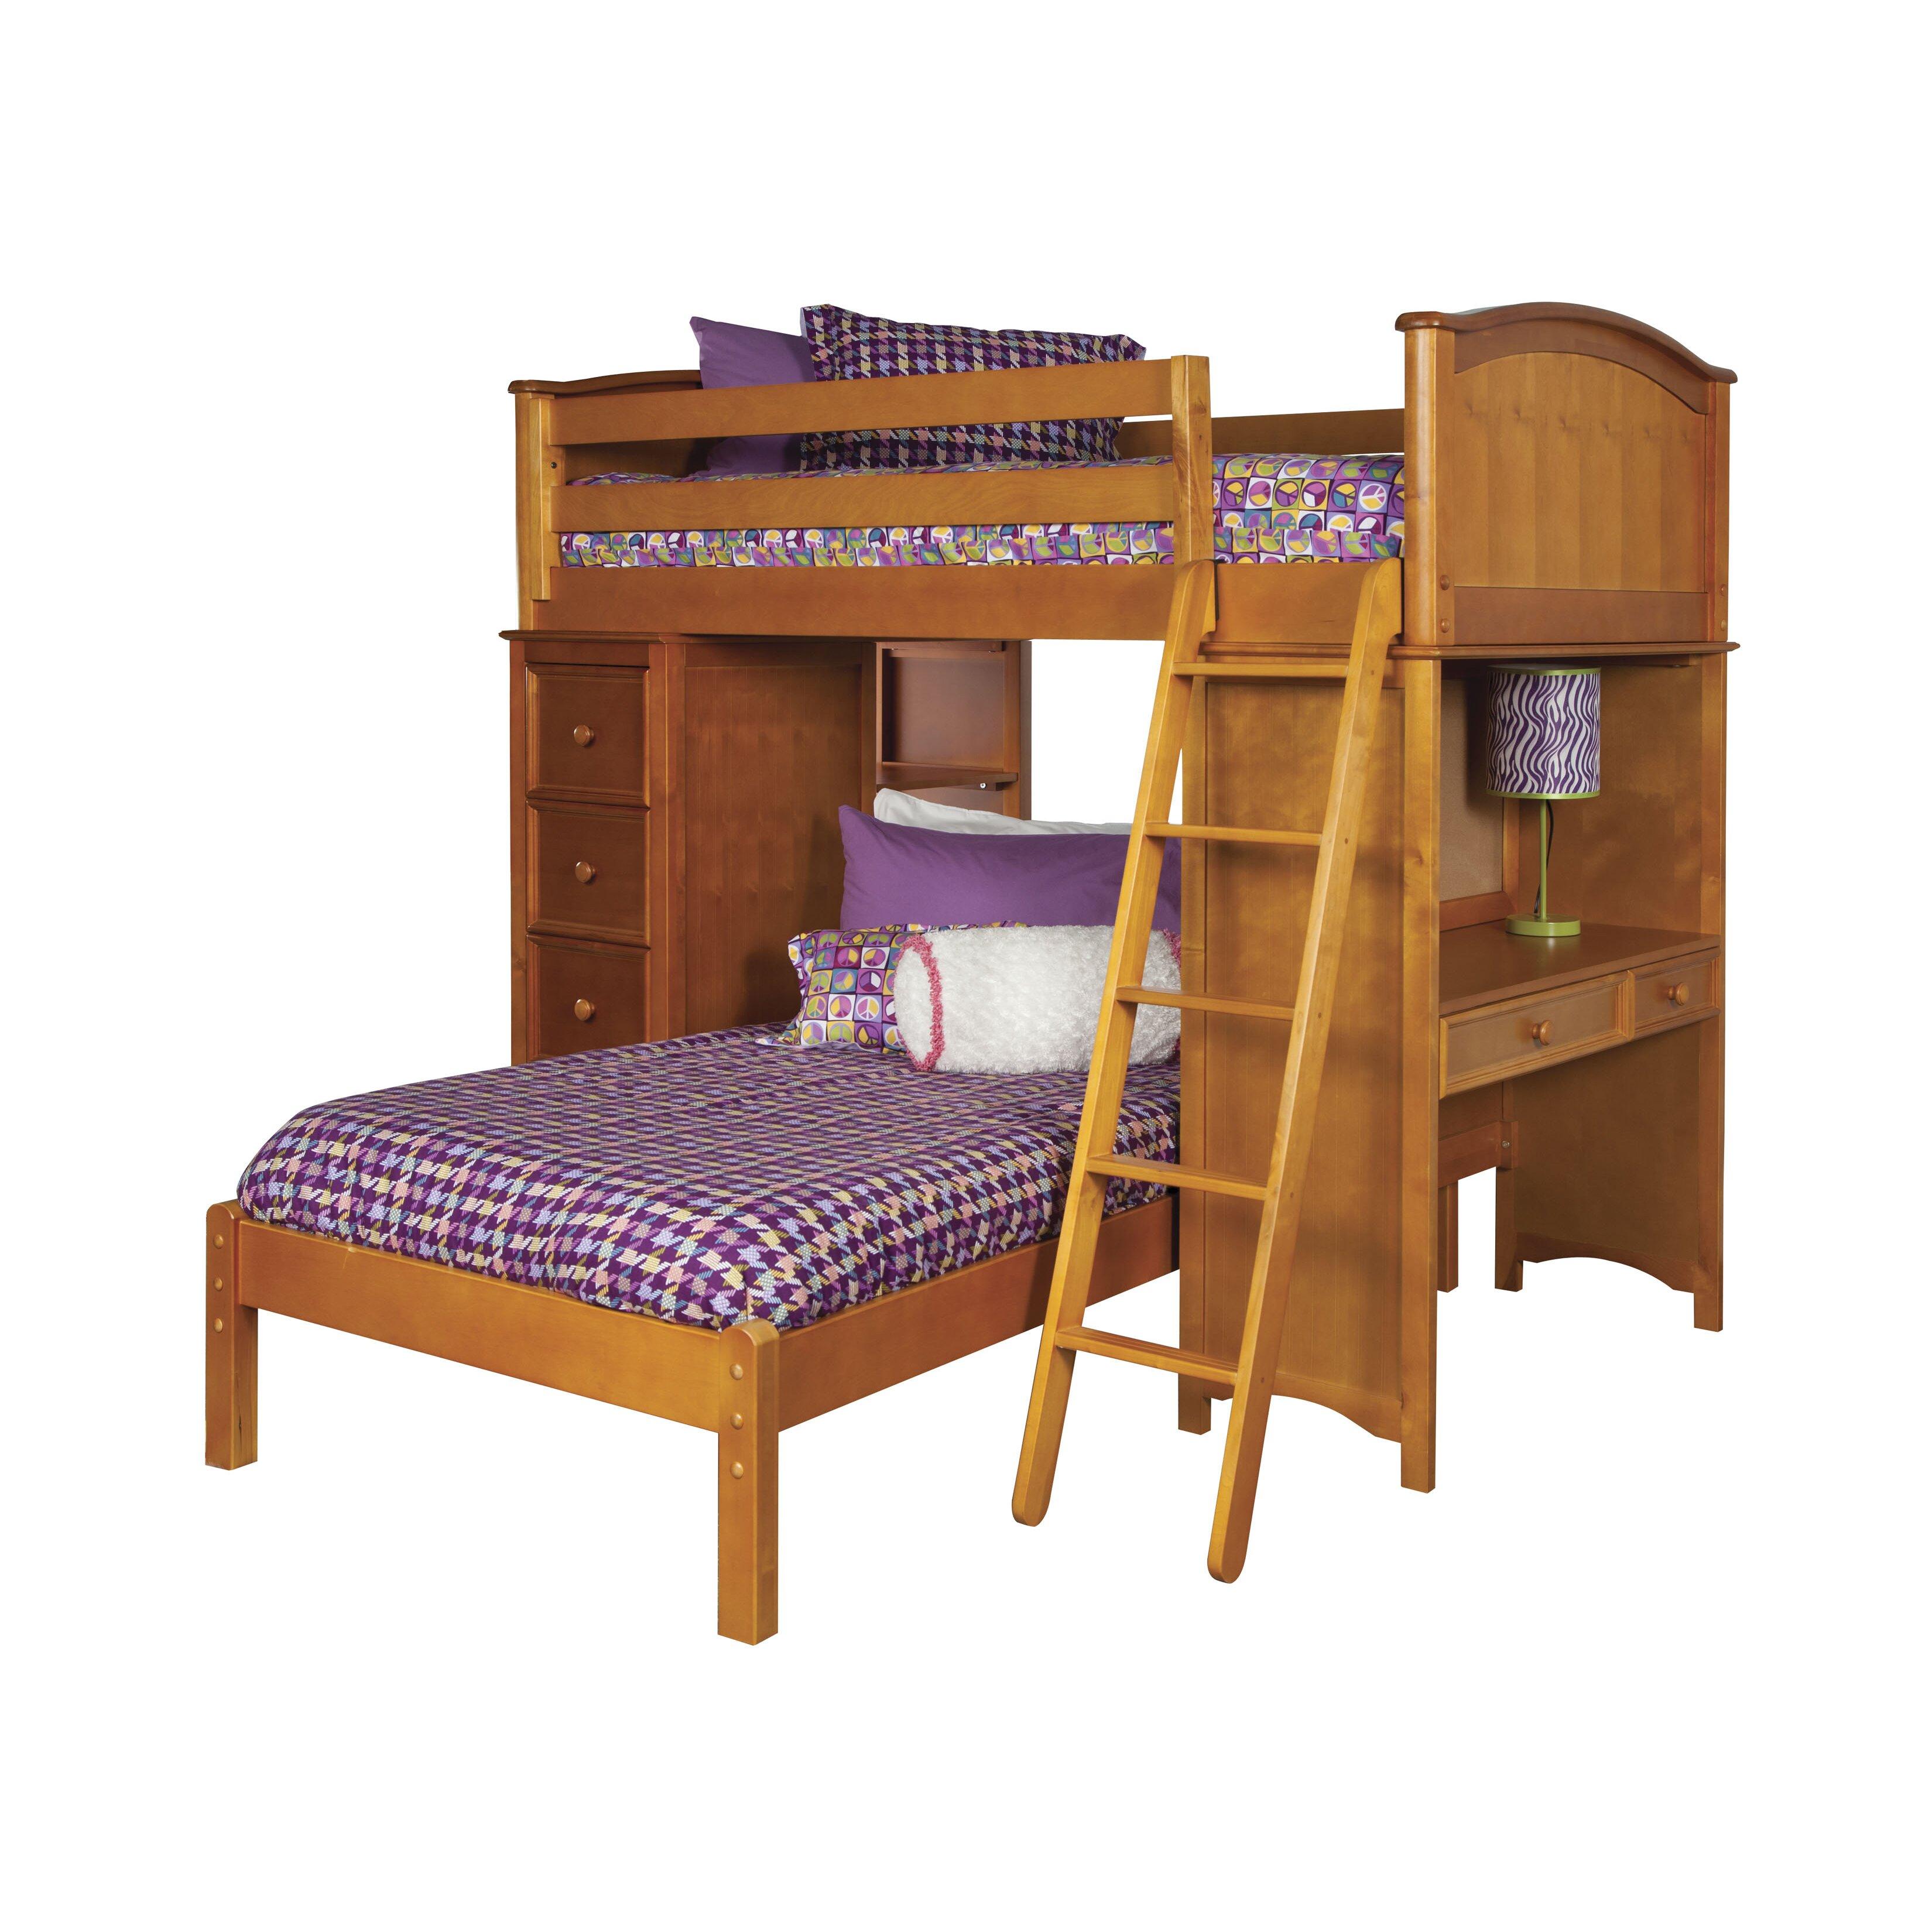 viv rae david twin loft bed customizable bedroom set reviews